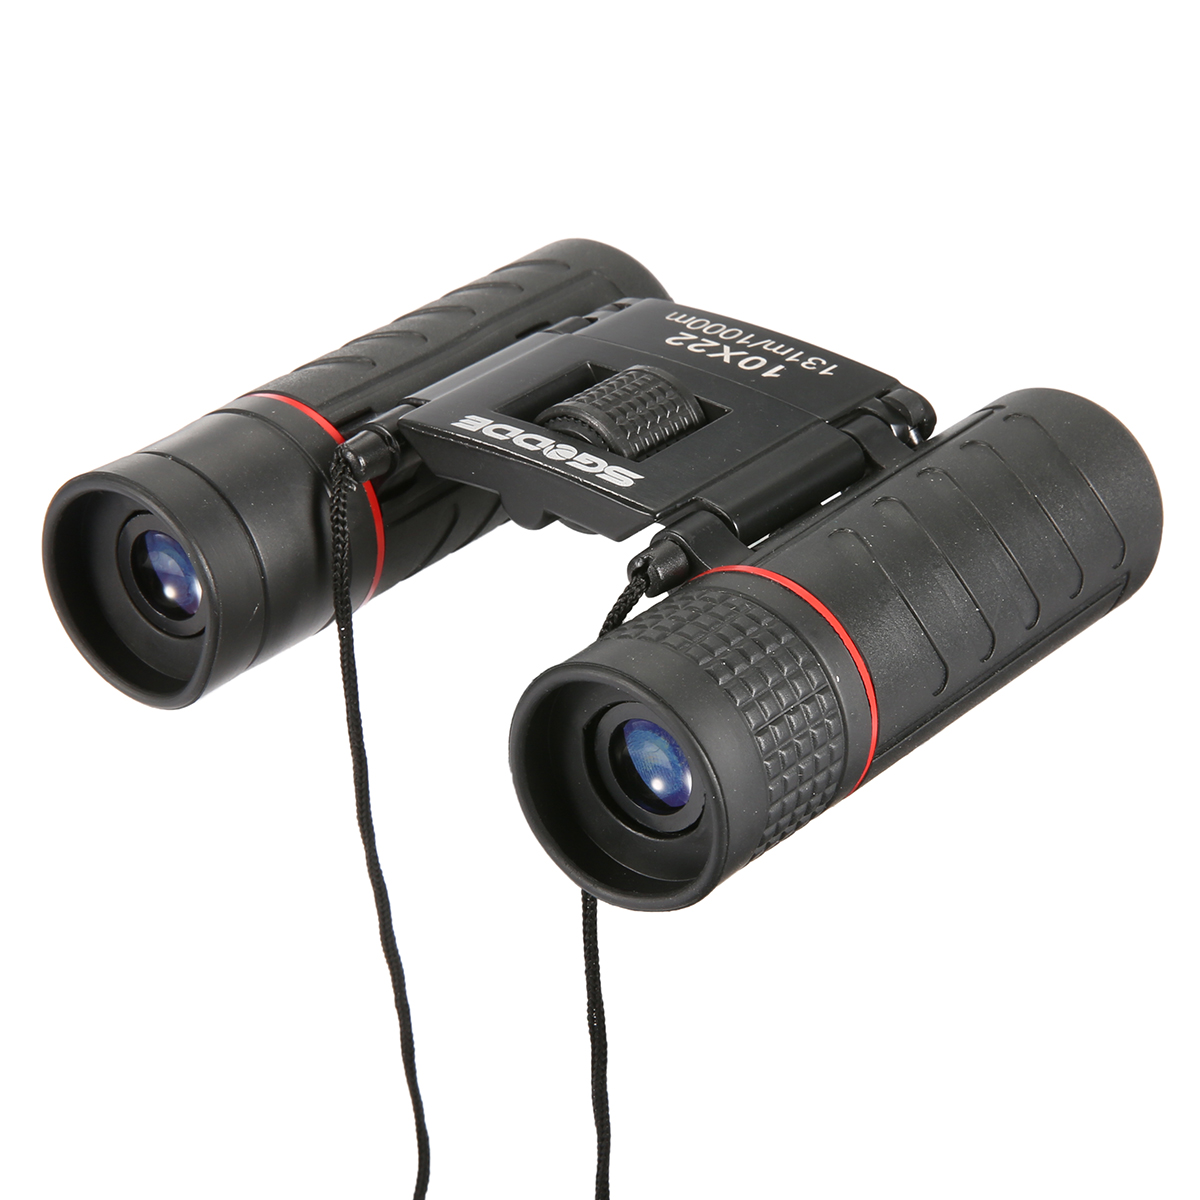 SGODDE 10x22 Binoculars Waterproof Folding High Powered Binoculars Mini Pocket Night Vision with Bag camerasphoto for Outdoor Bird Watching Travelling Concert